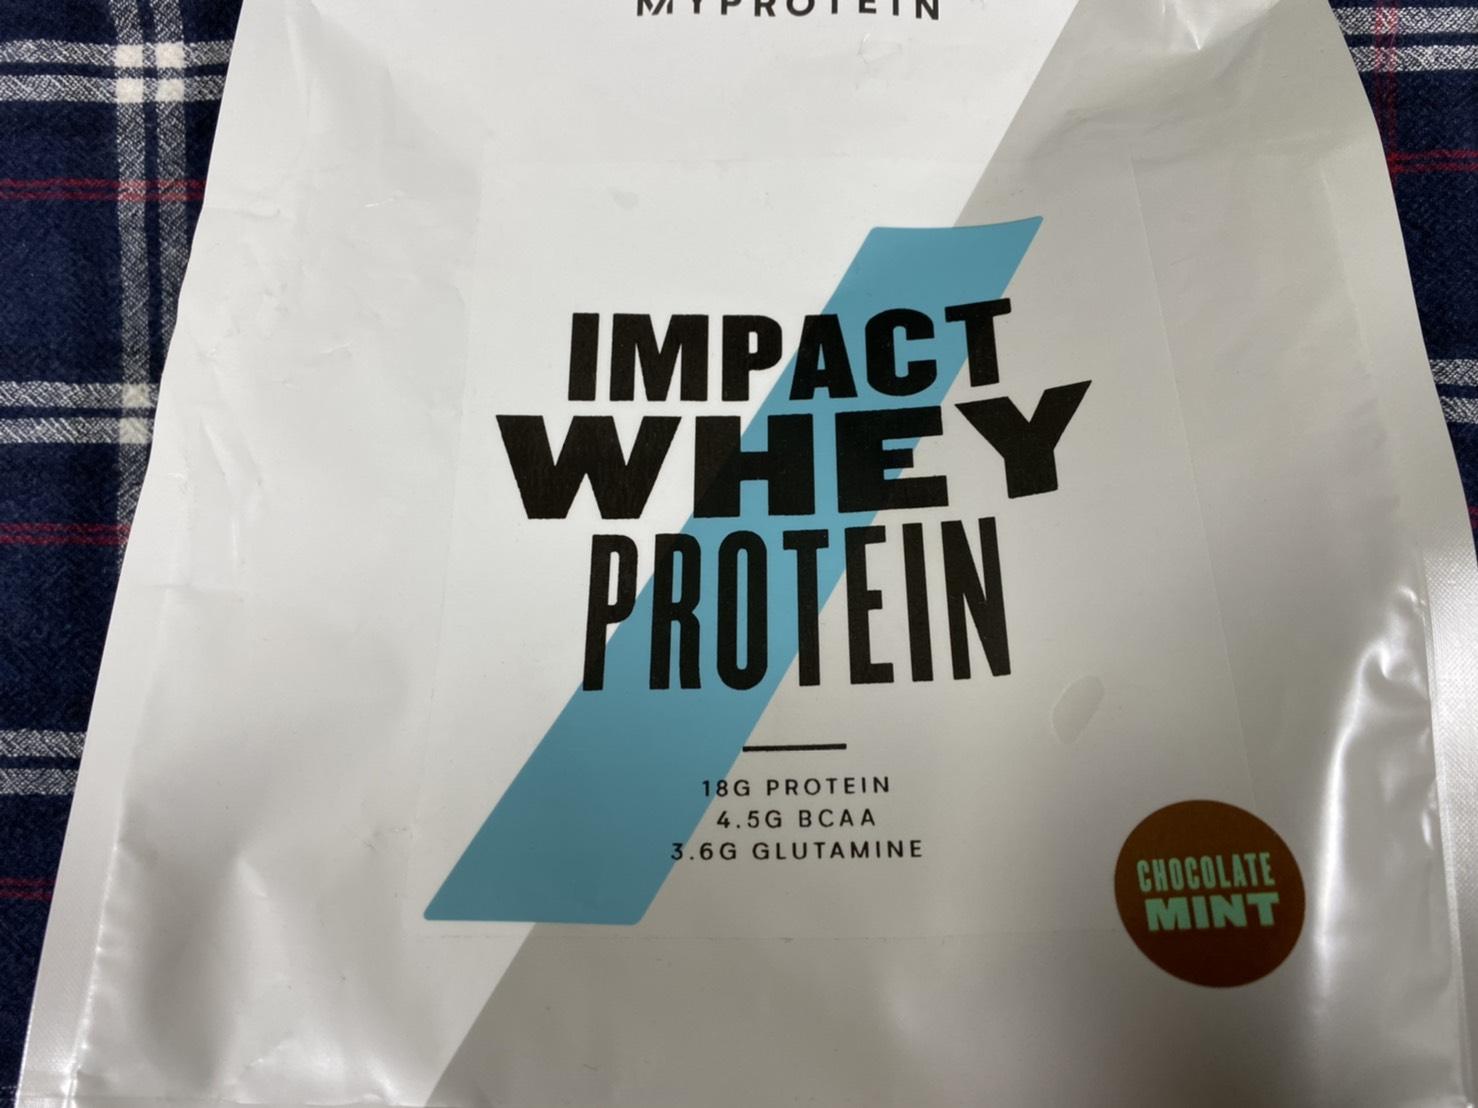 Impactホエイプロテイン:チョコミント味